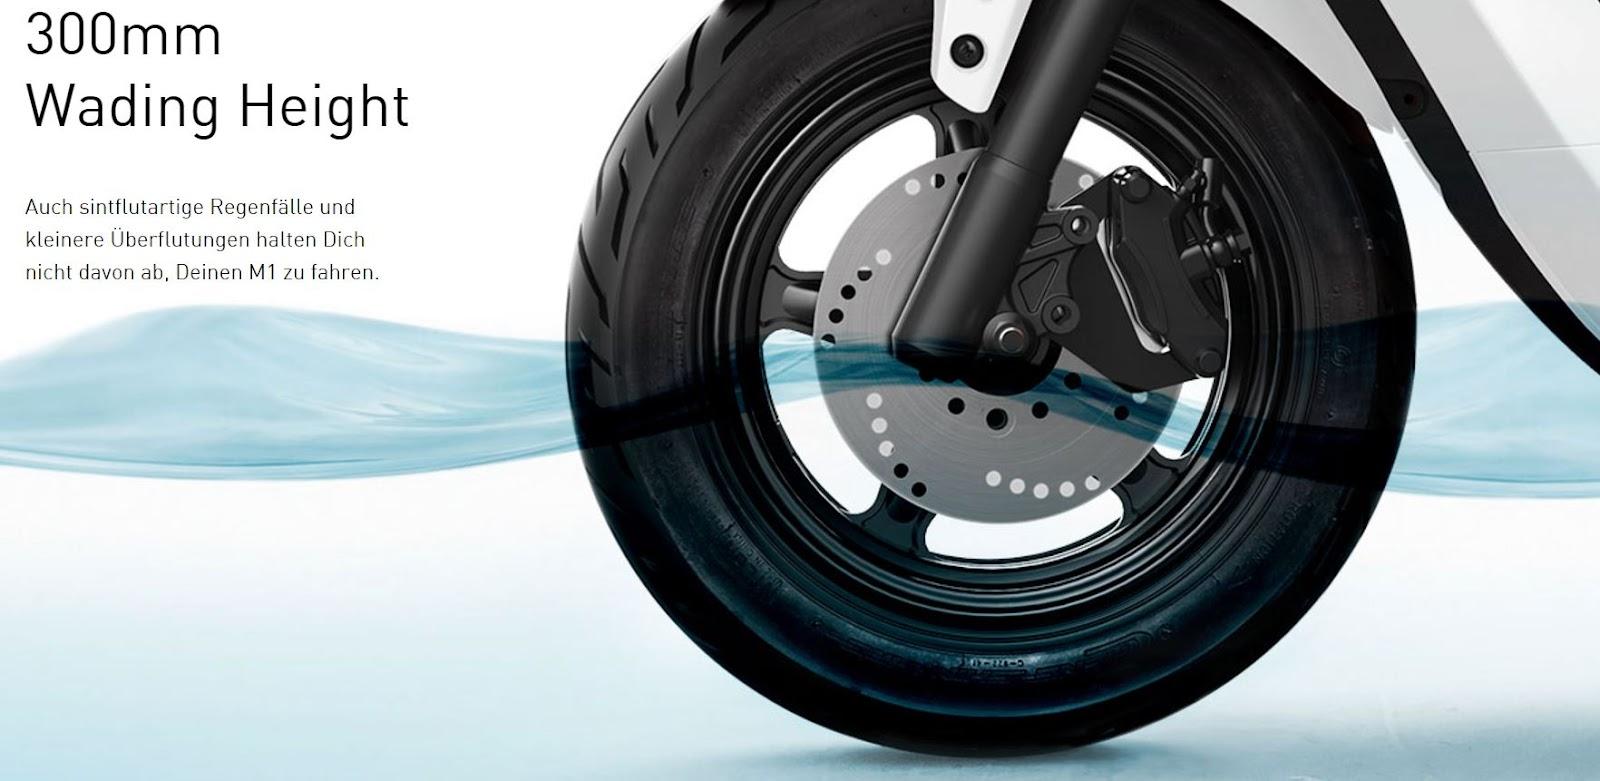 TRANKVILE_electric_vehicles_M1_Wasserfahrt.jpg